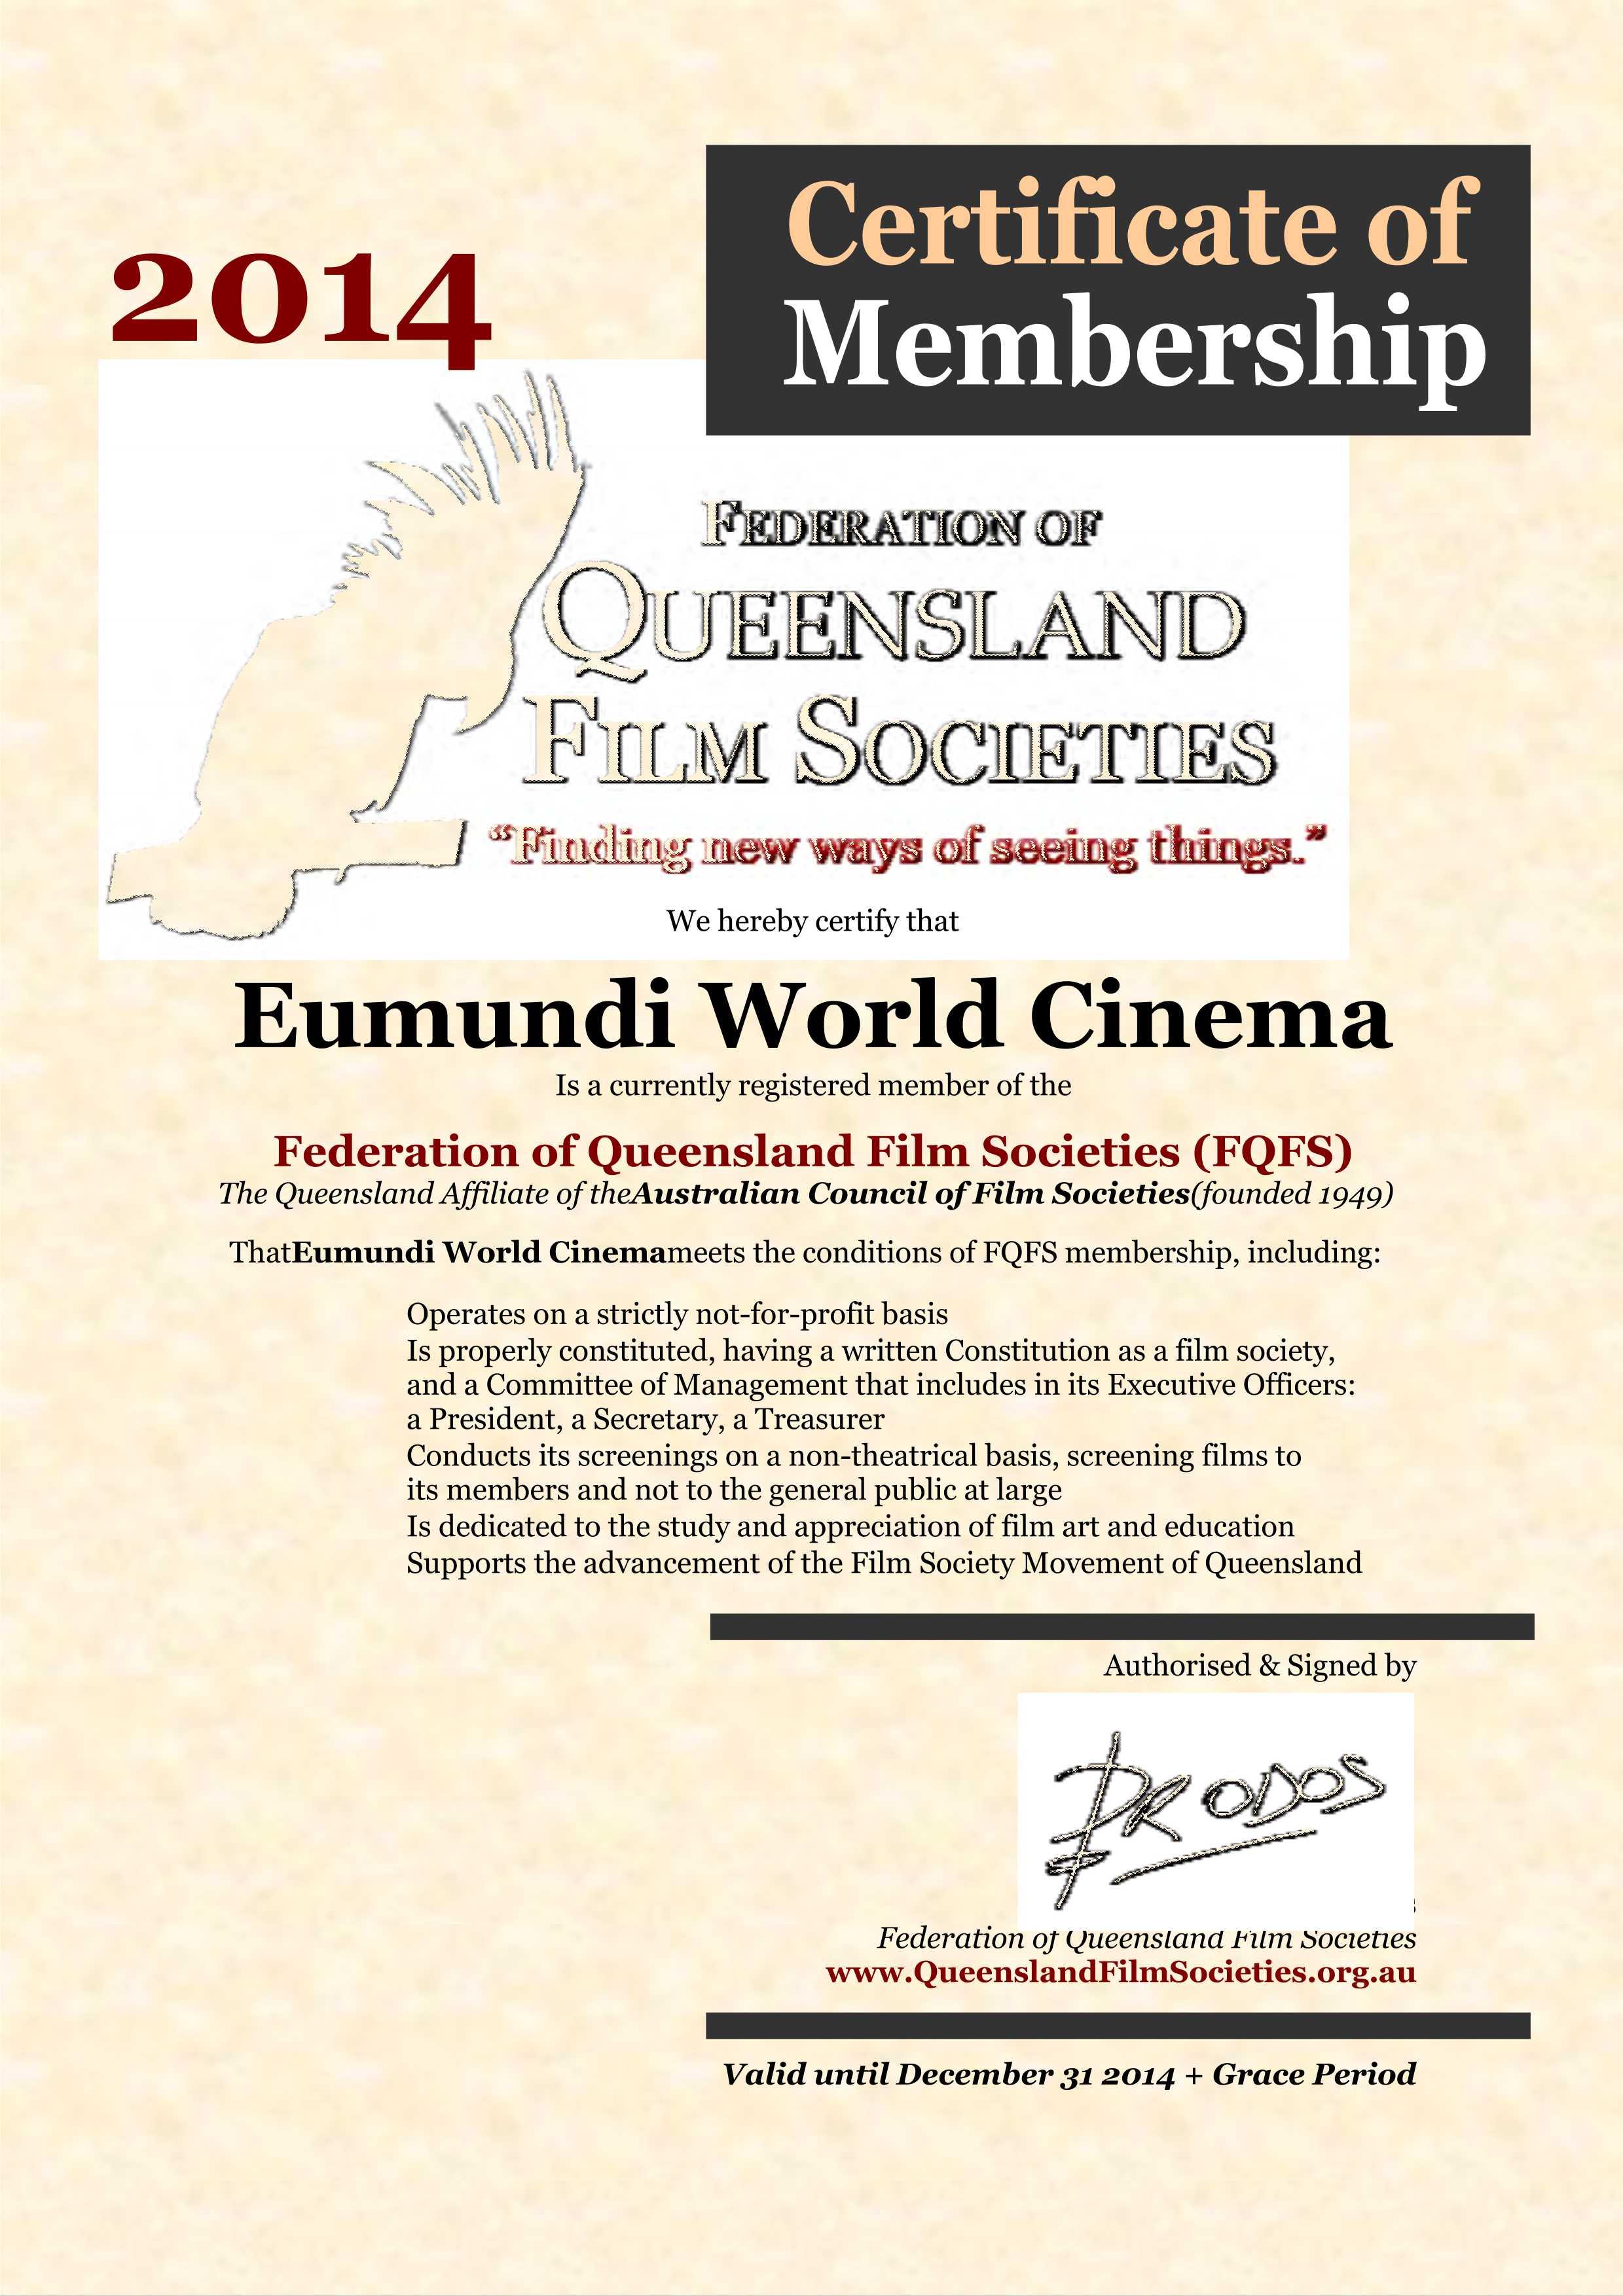 Eumundi World Cinema - FQFS 2014 Membership Certificate.jpg